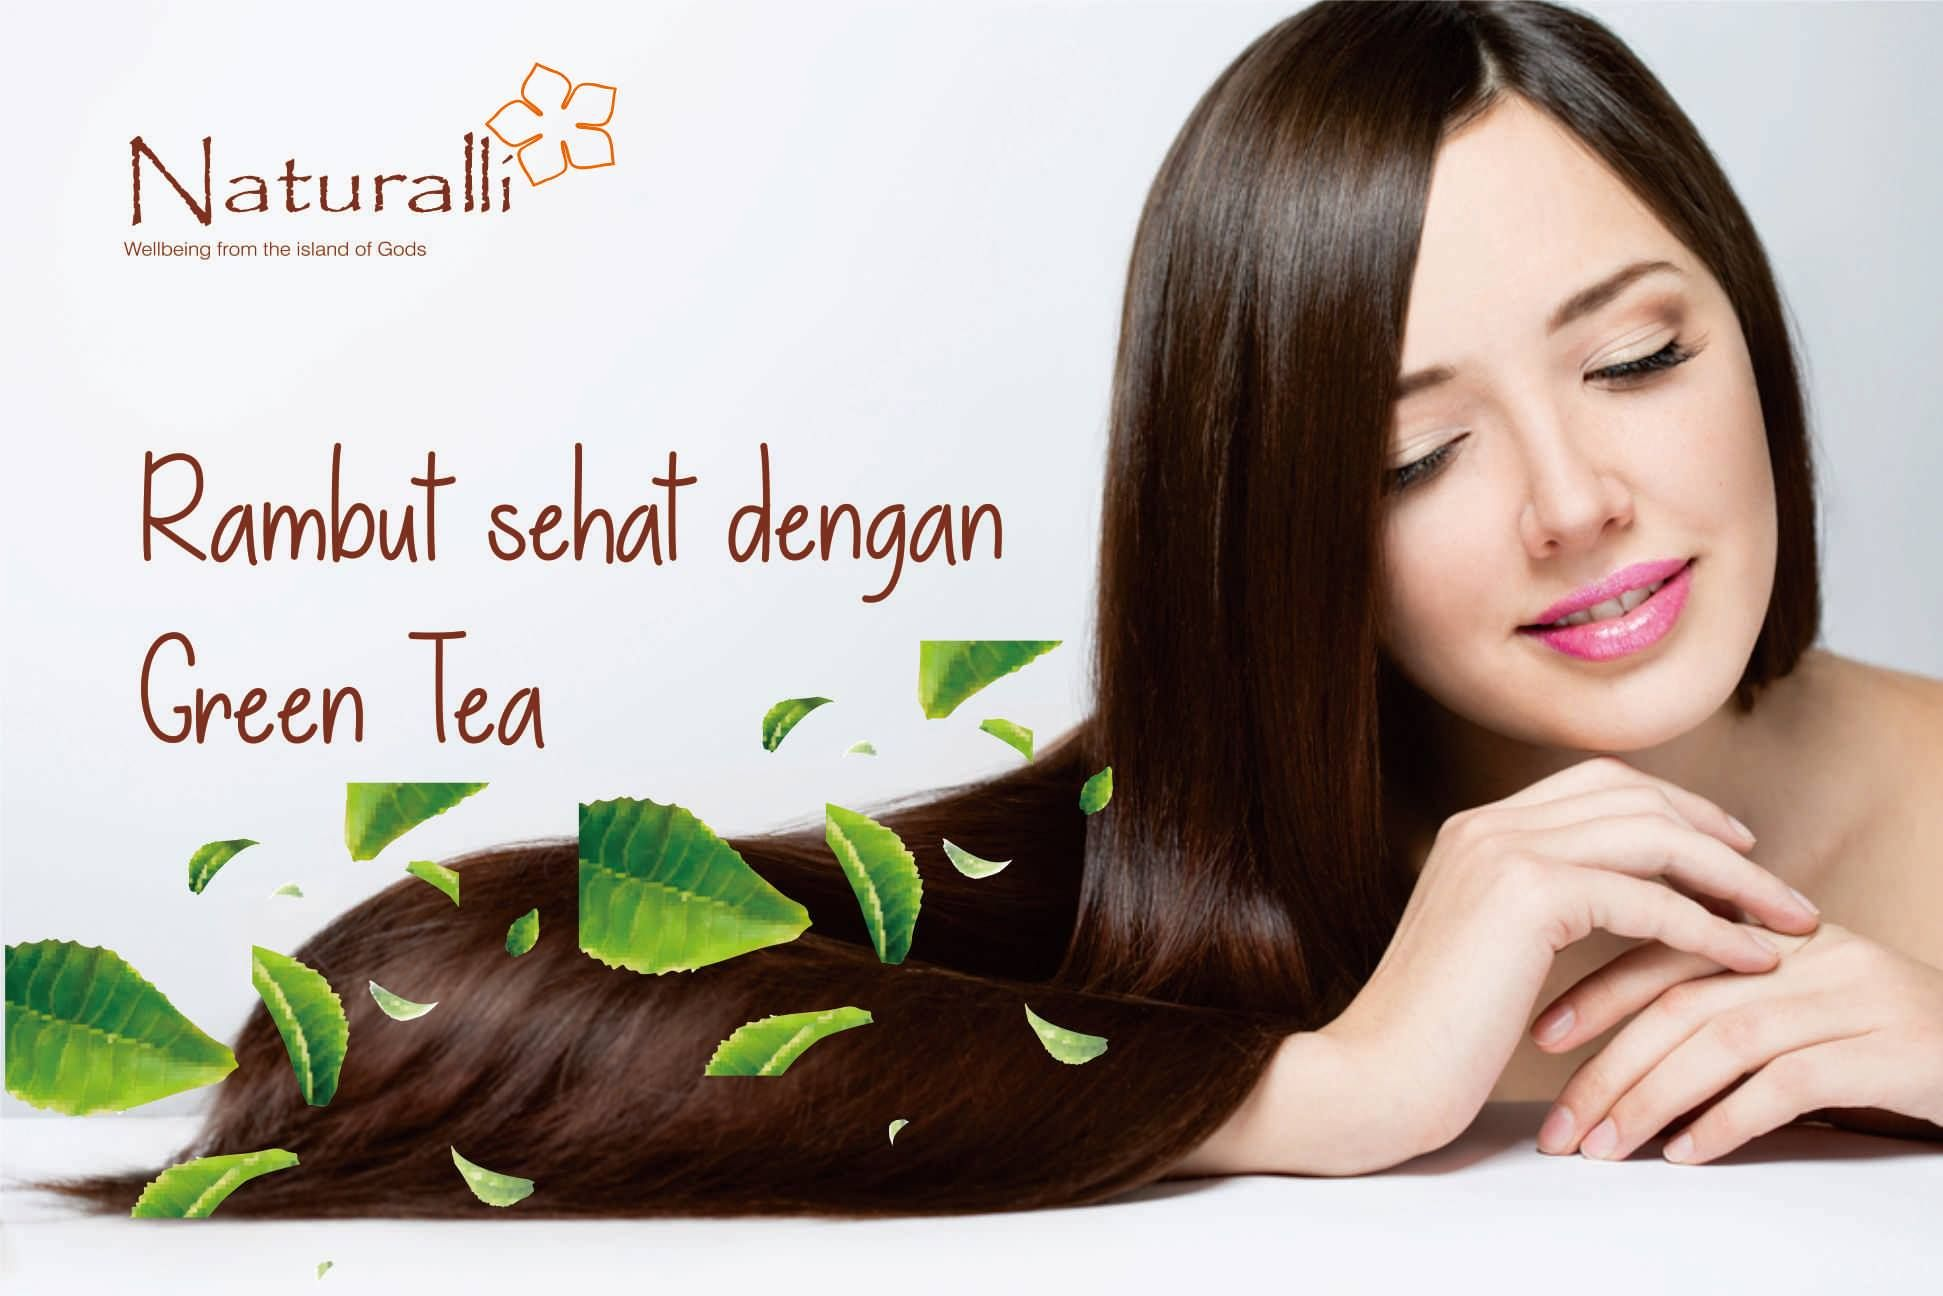 Green Tea Shampoo Natural Bali Perawatan Rambut Rontok Produk Kecantikan Alami Rambut Rontok